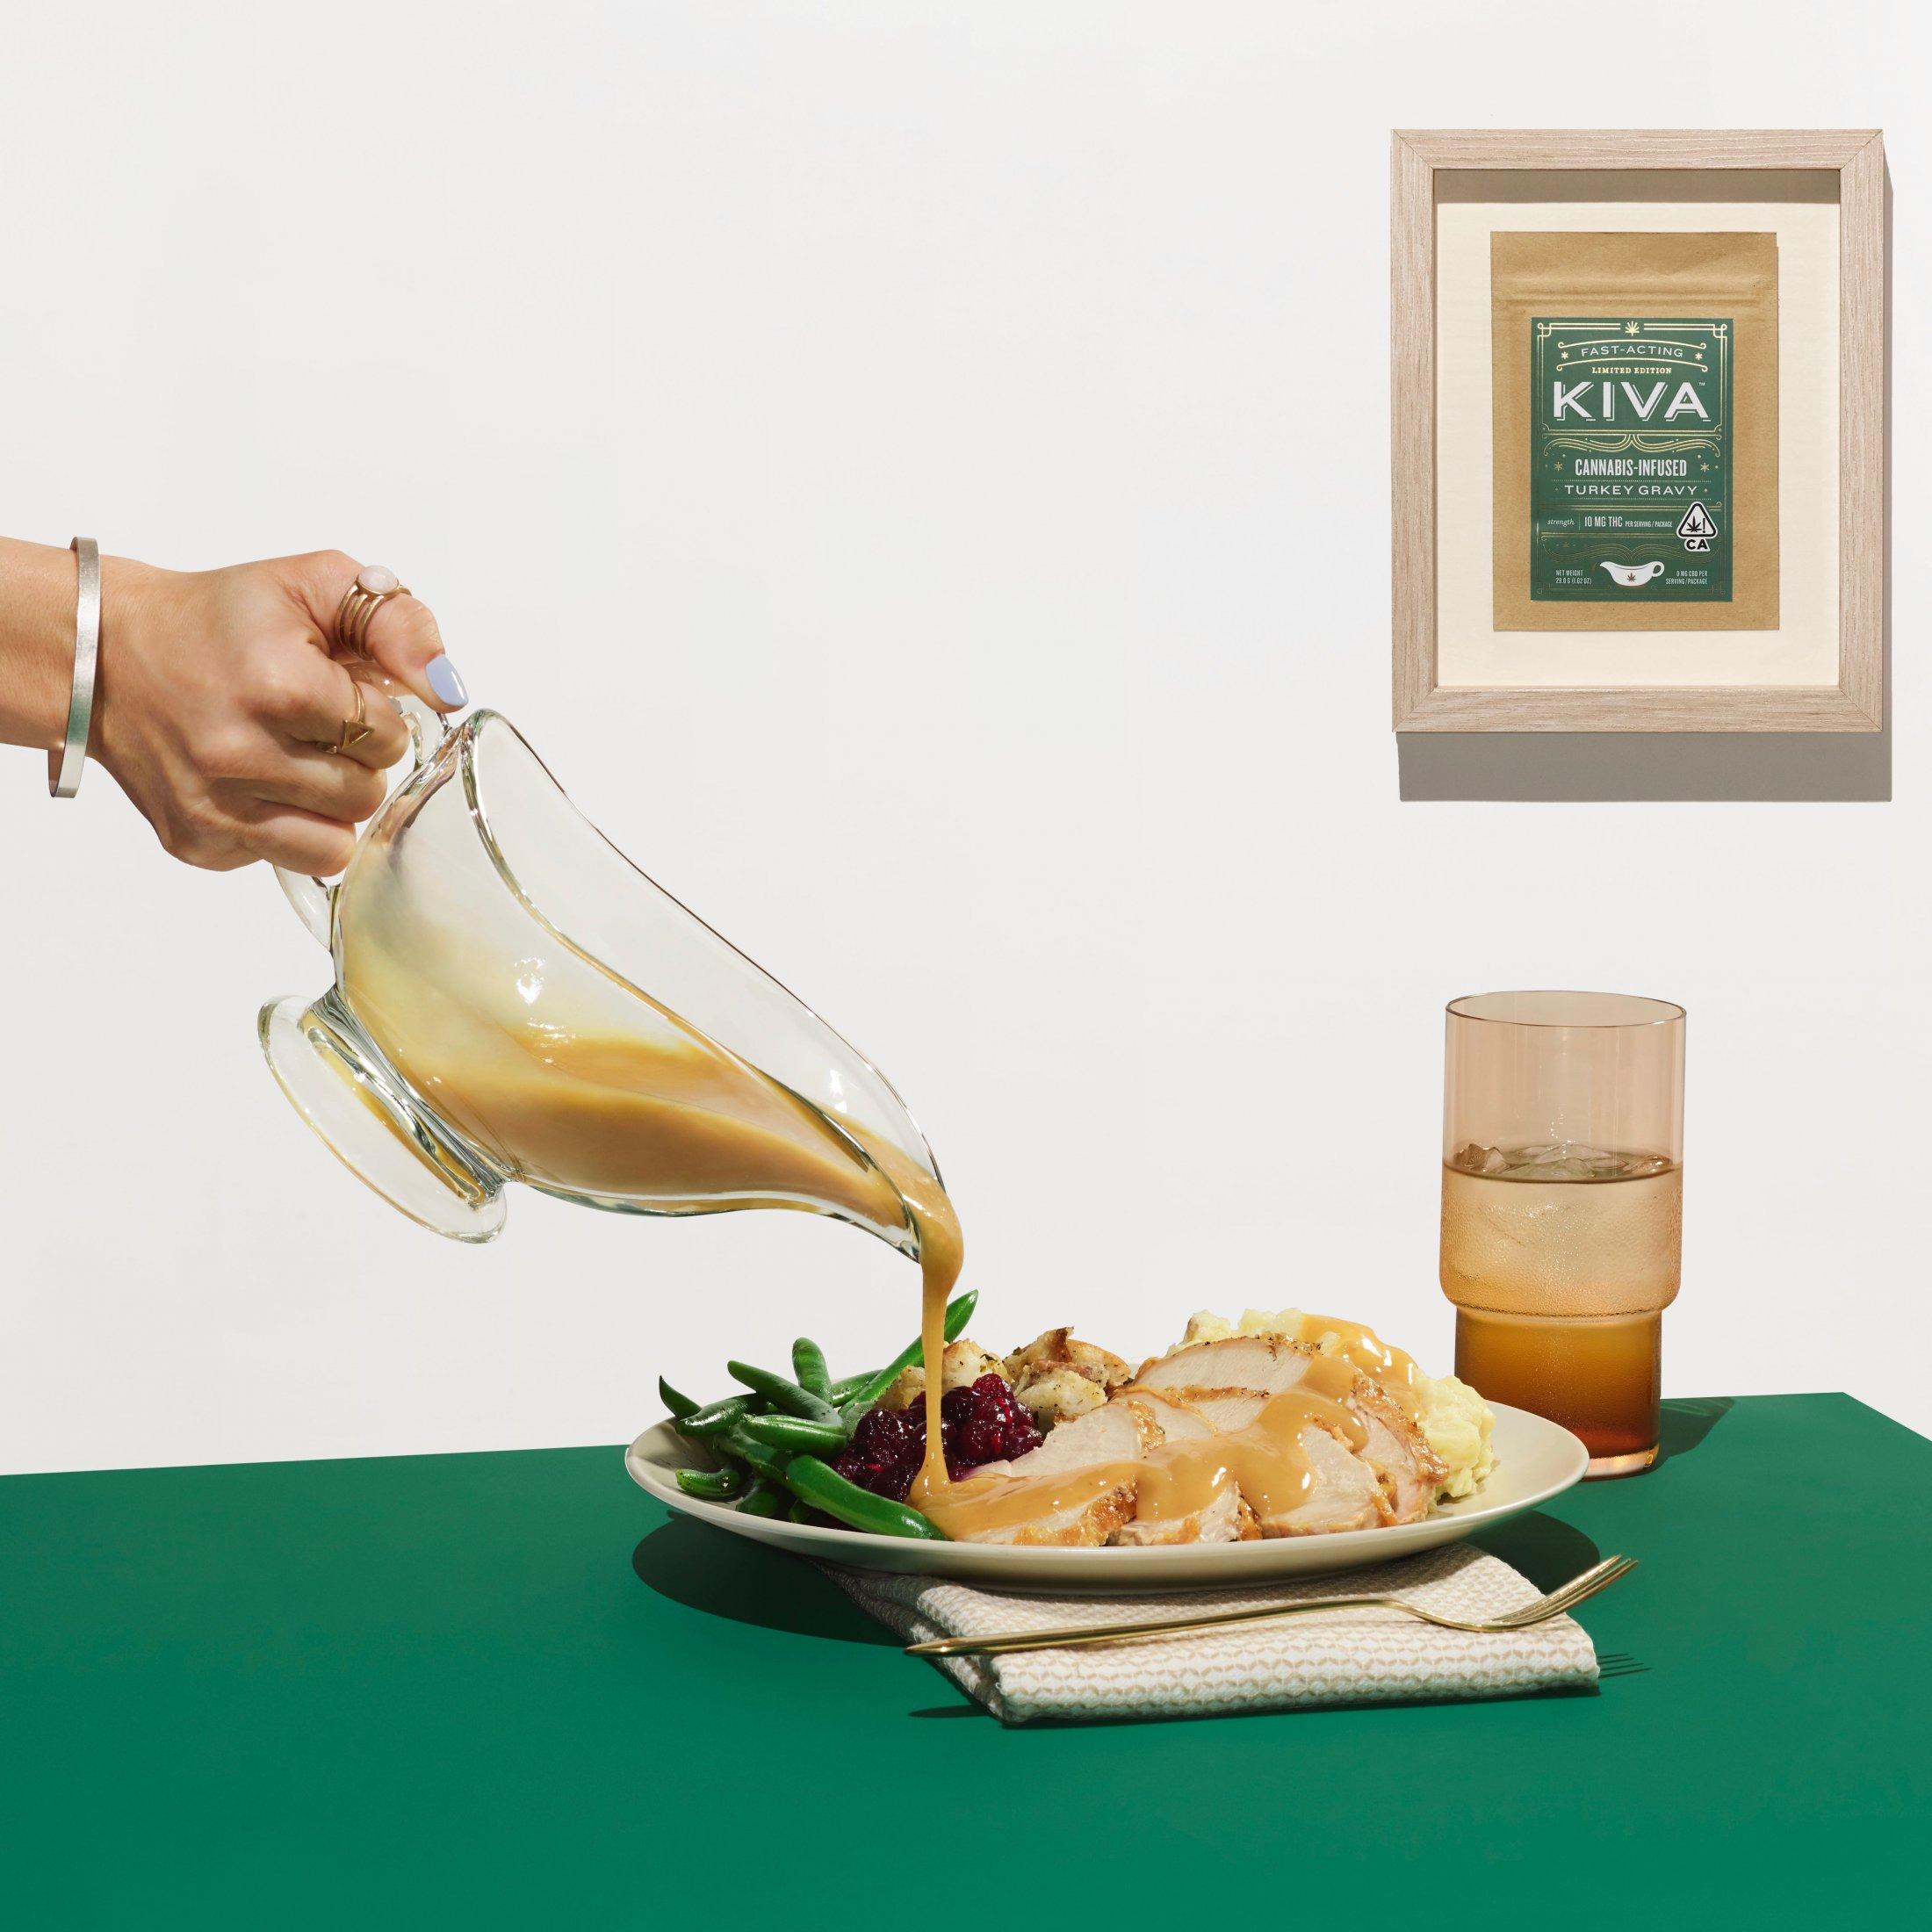 Kiva Confections: It's All Gravy